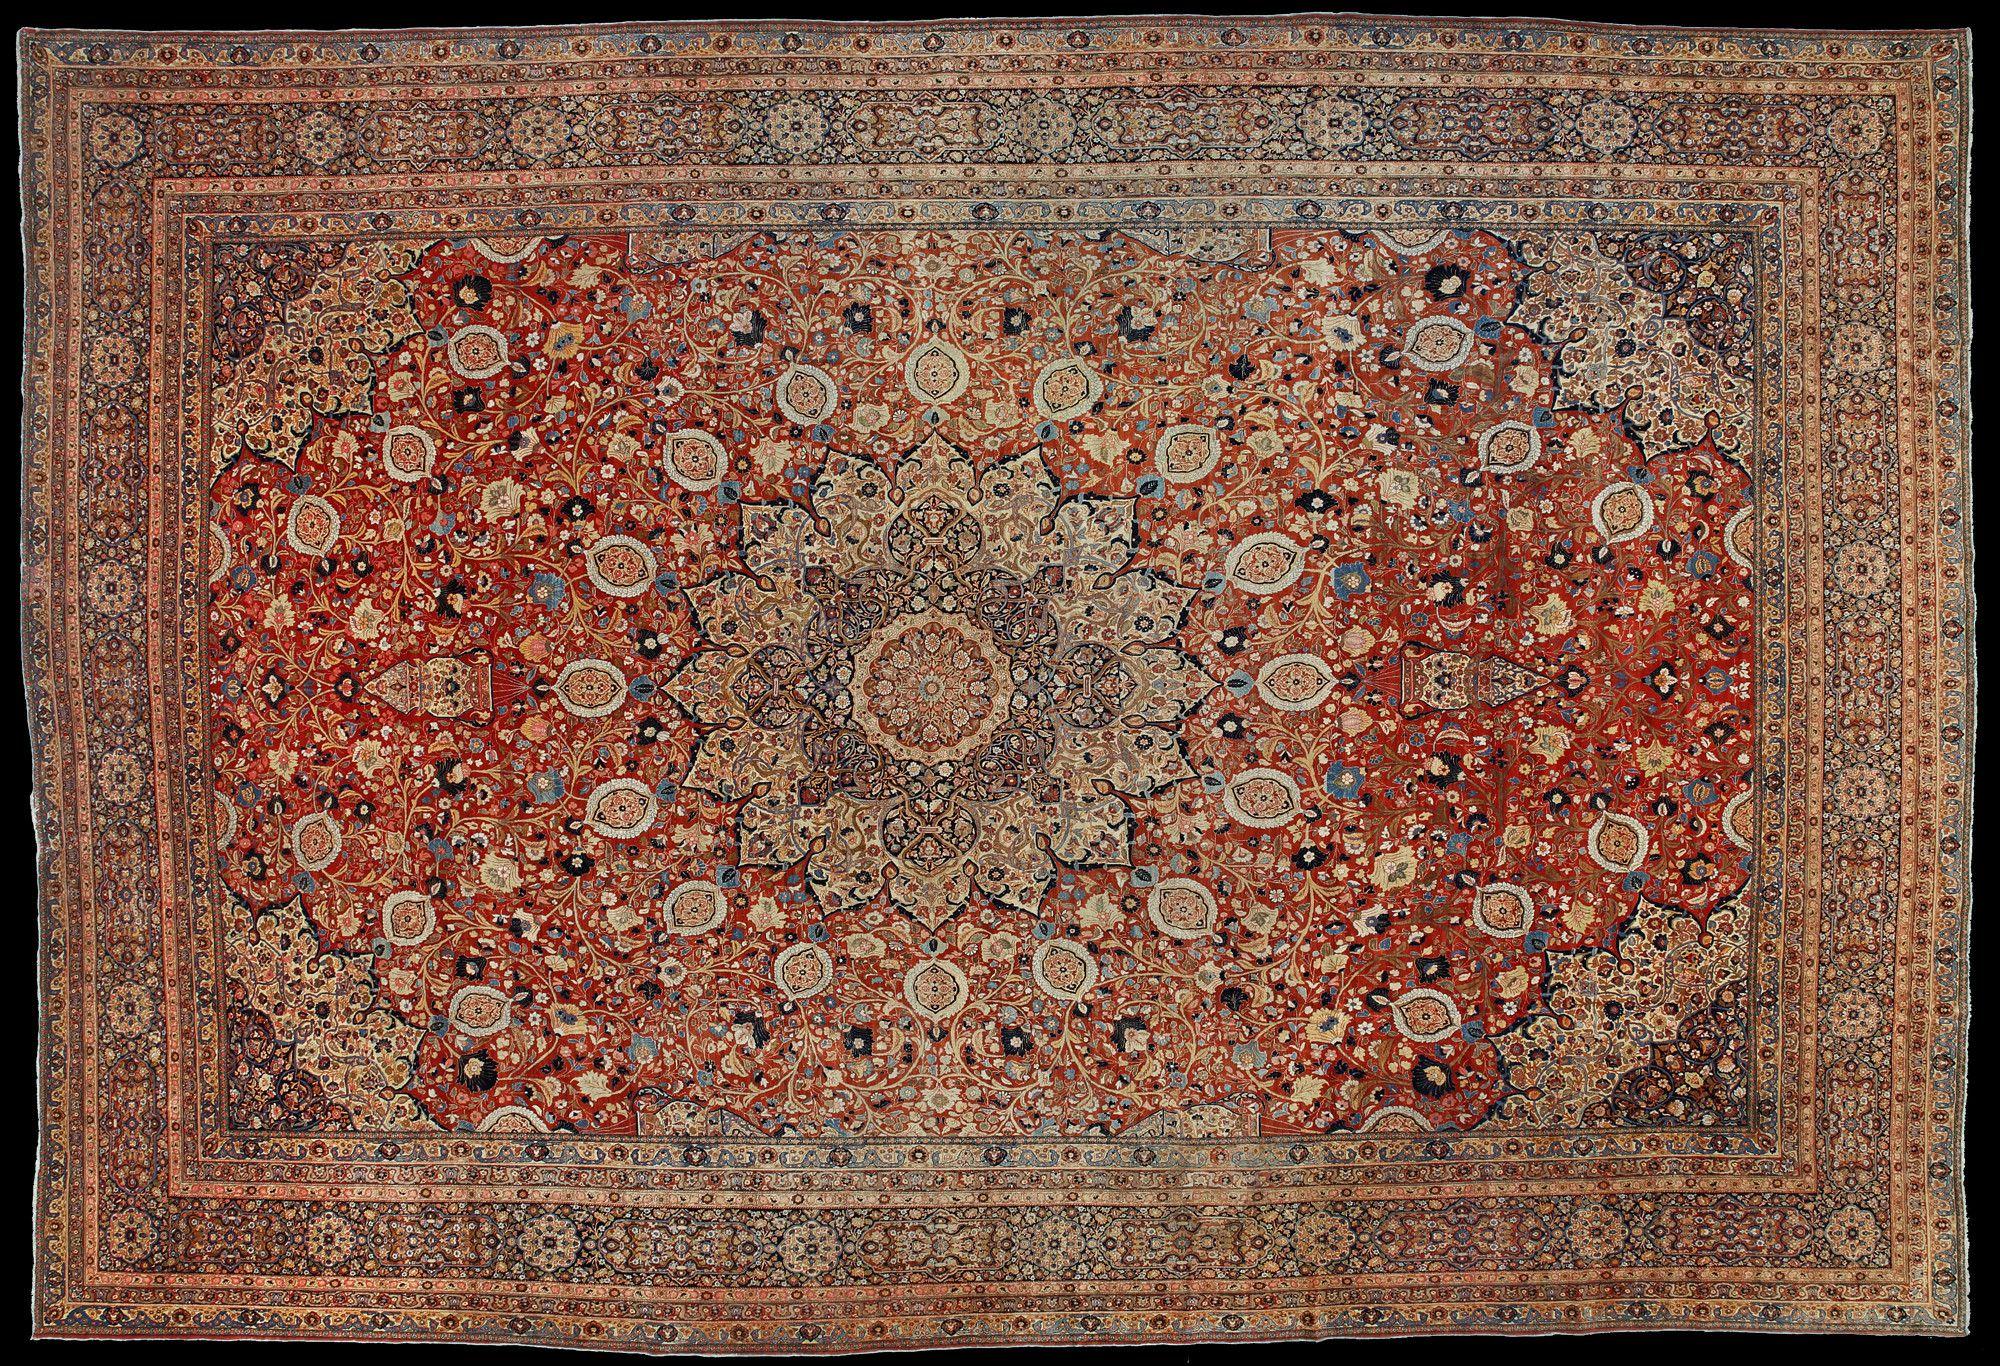 Türkish Tabriz Carpet _                    South Azerbaijan/Tabriz,Fully Turkish City_ Güney Azerbaycan/Tebriz, Sırf Türk Kenti_ _گونی آزربایجان تاماما تورک شه هه ری